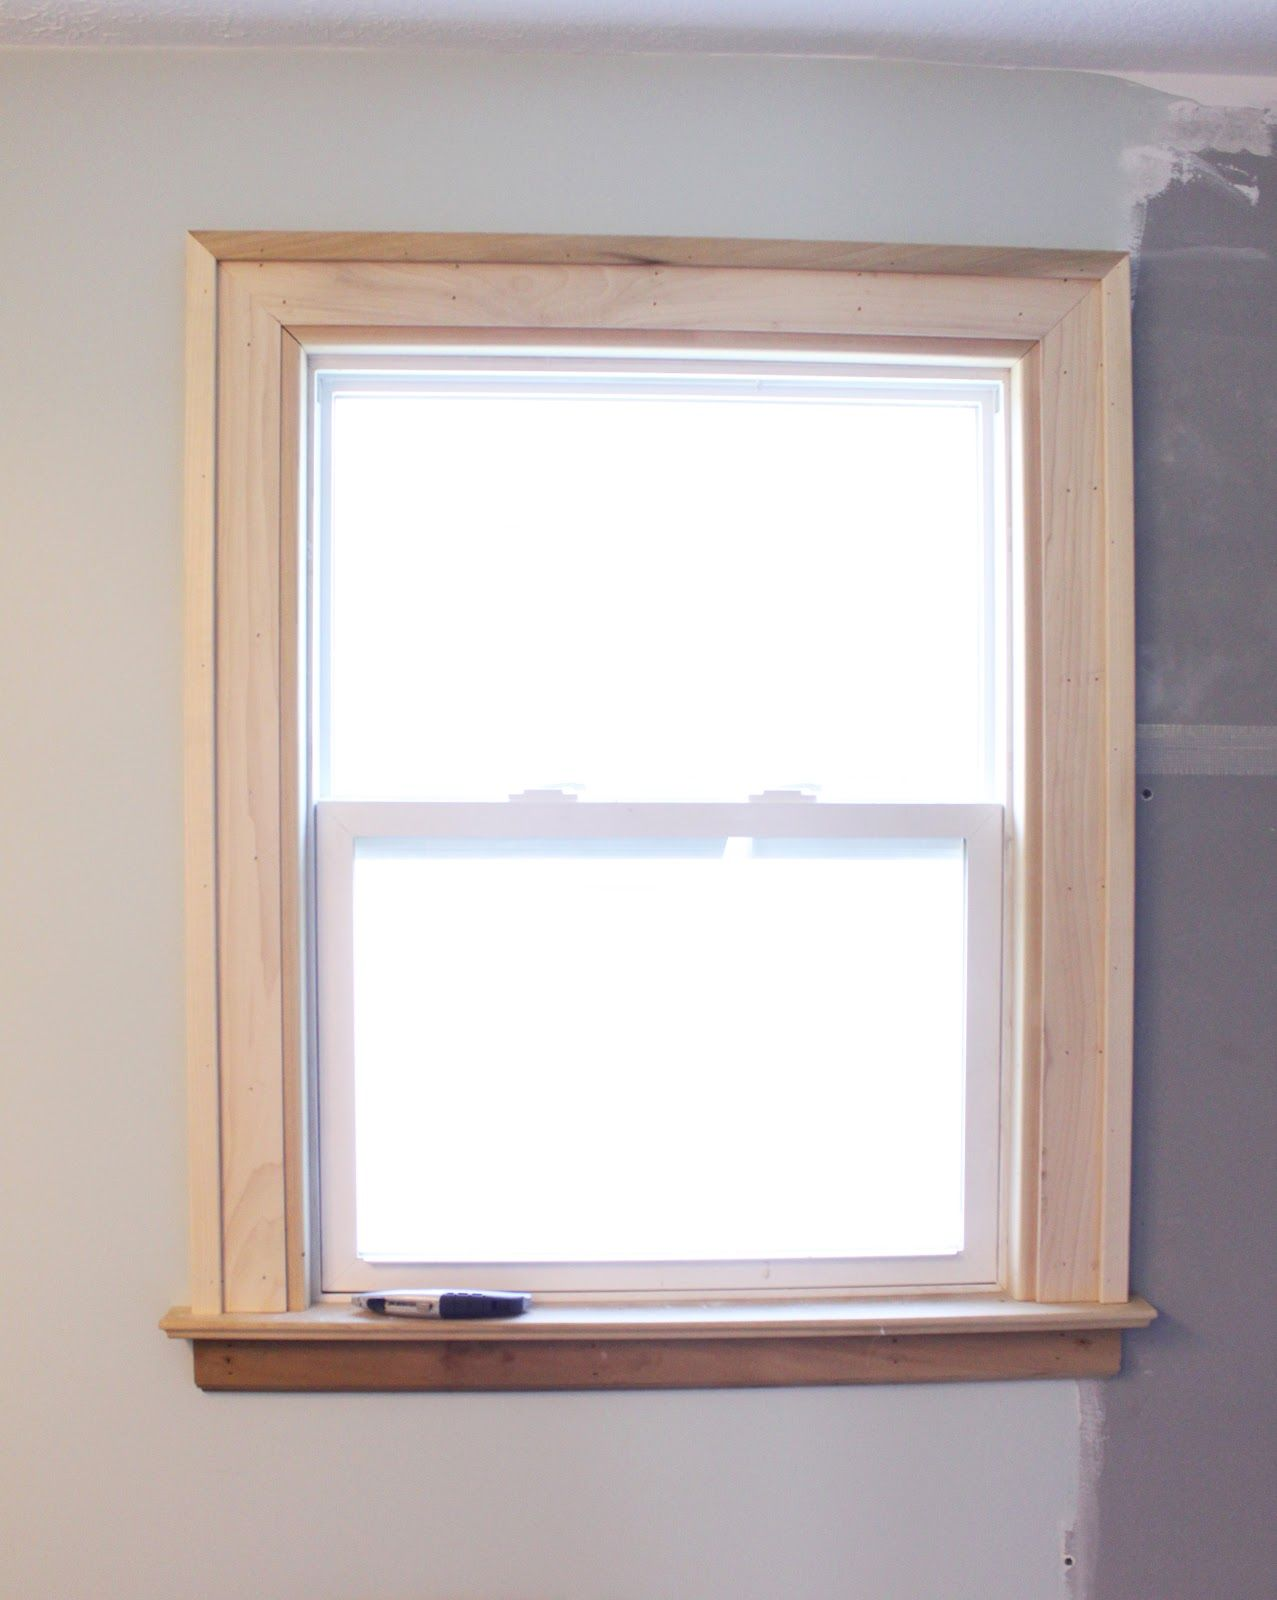 Interior window sill trim ideas - Window Trim